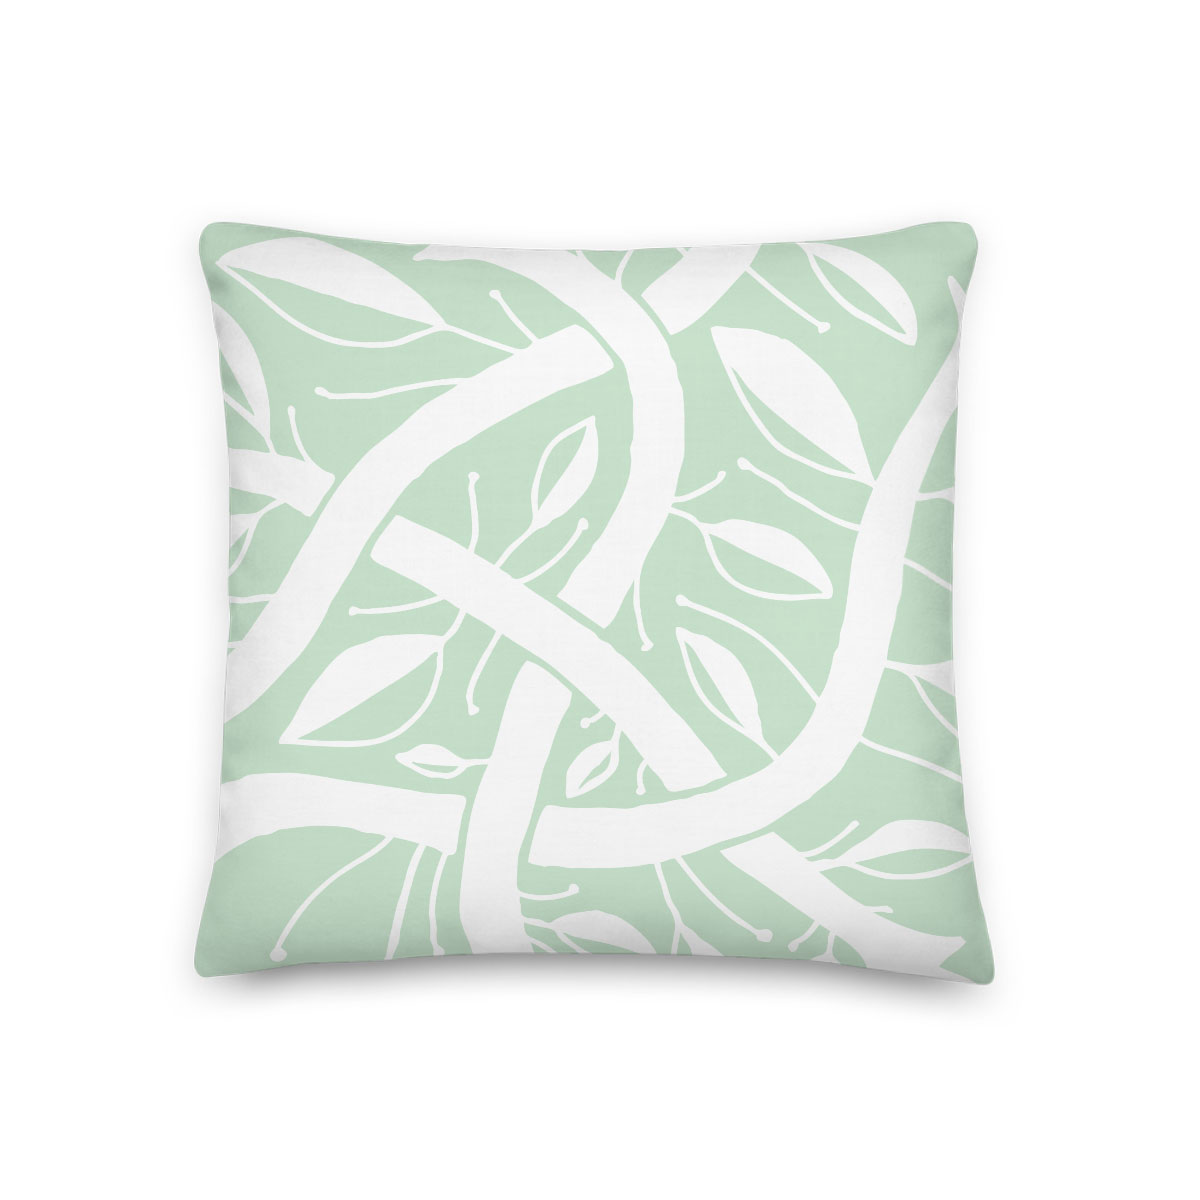 Mint Green Abstract Botanical Pillow (Bogolanfini Garden) – indoor/outdoor pillow